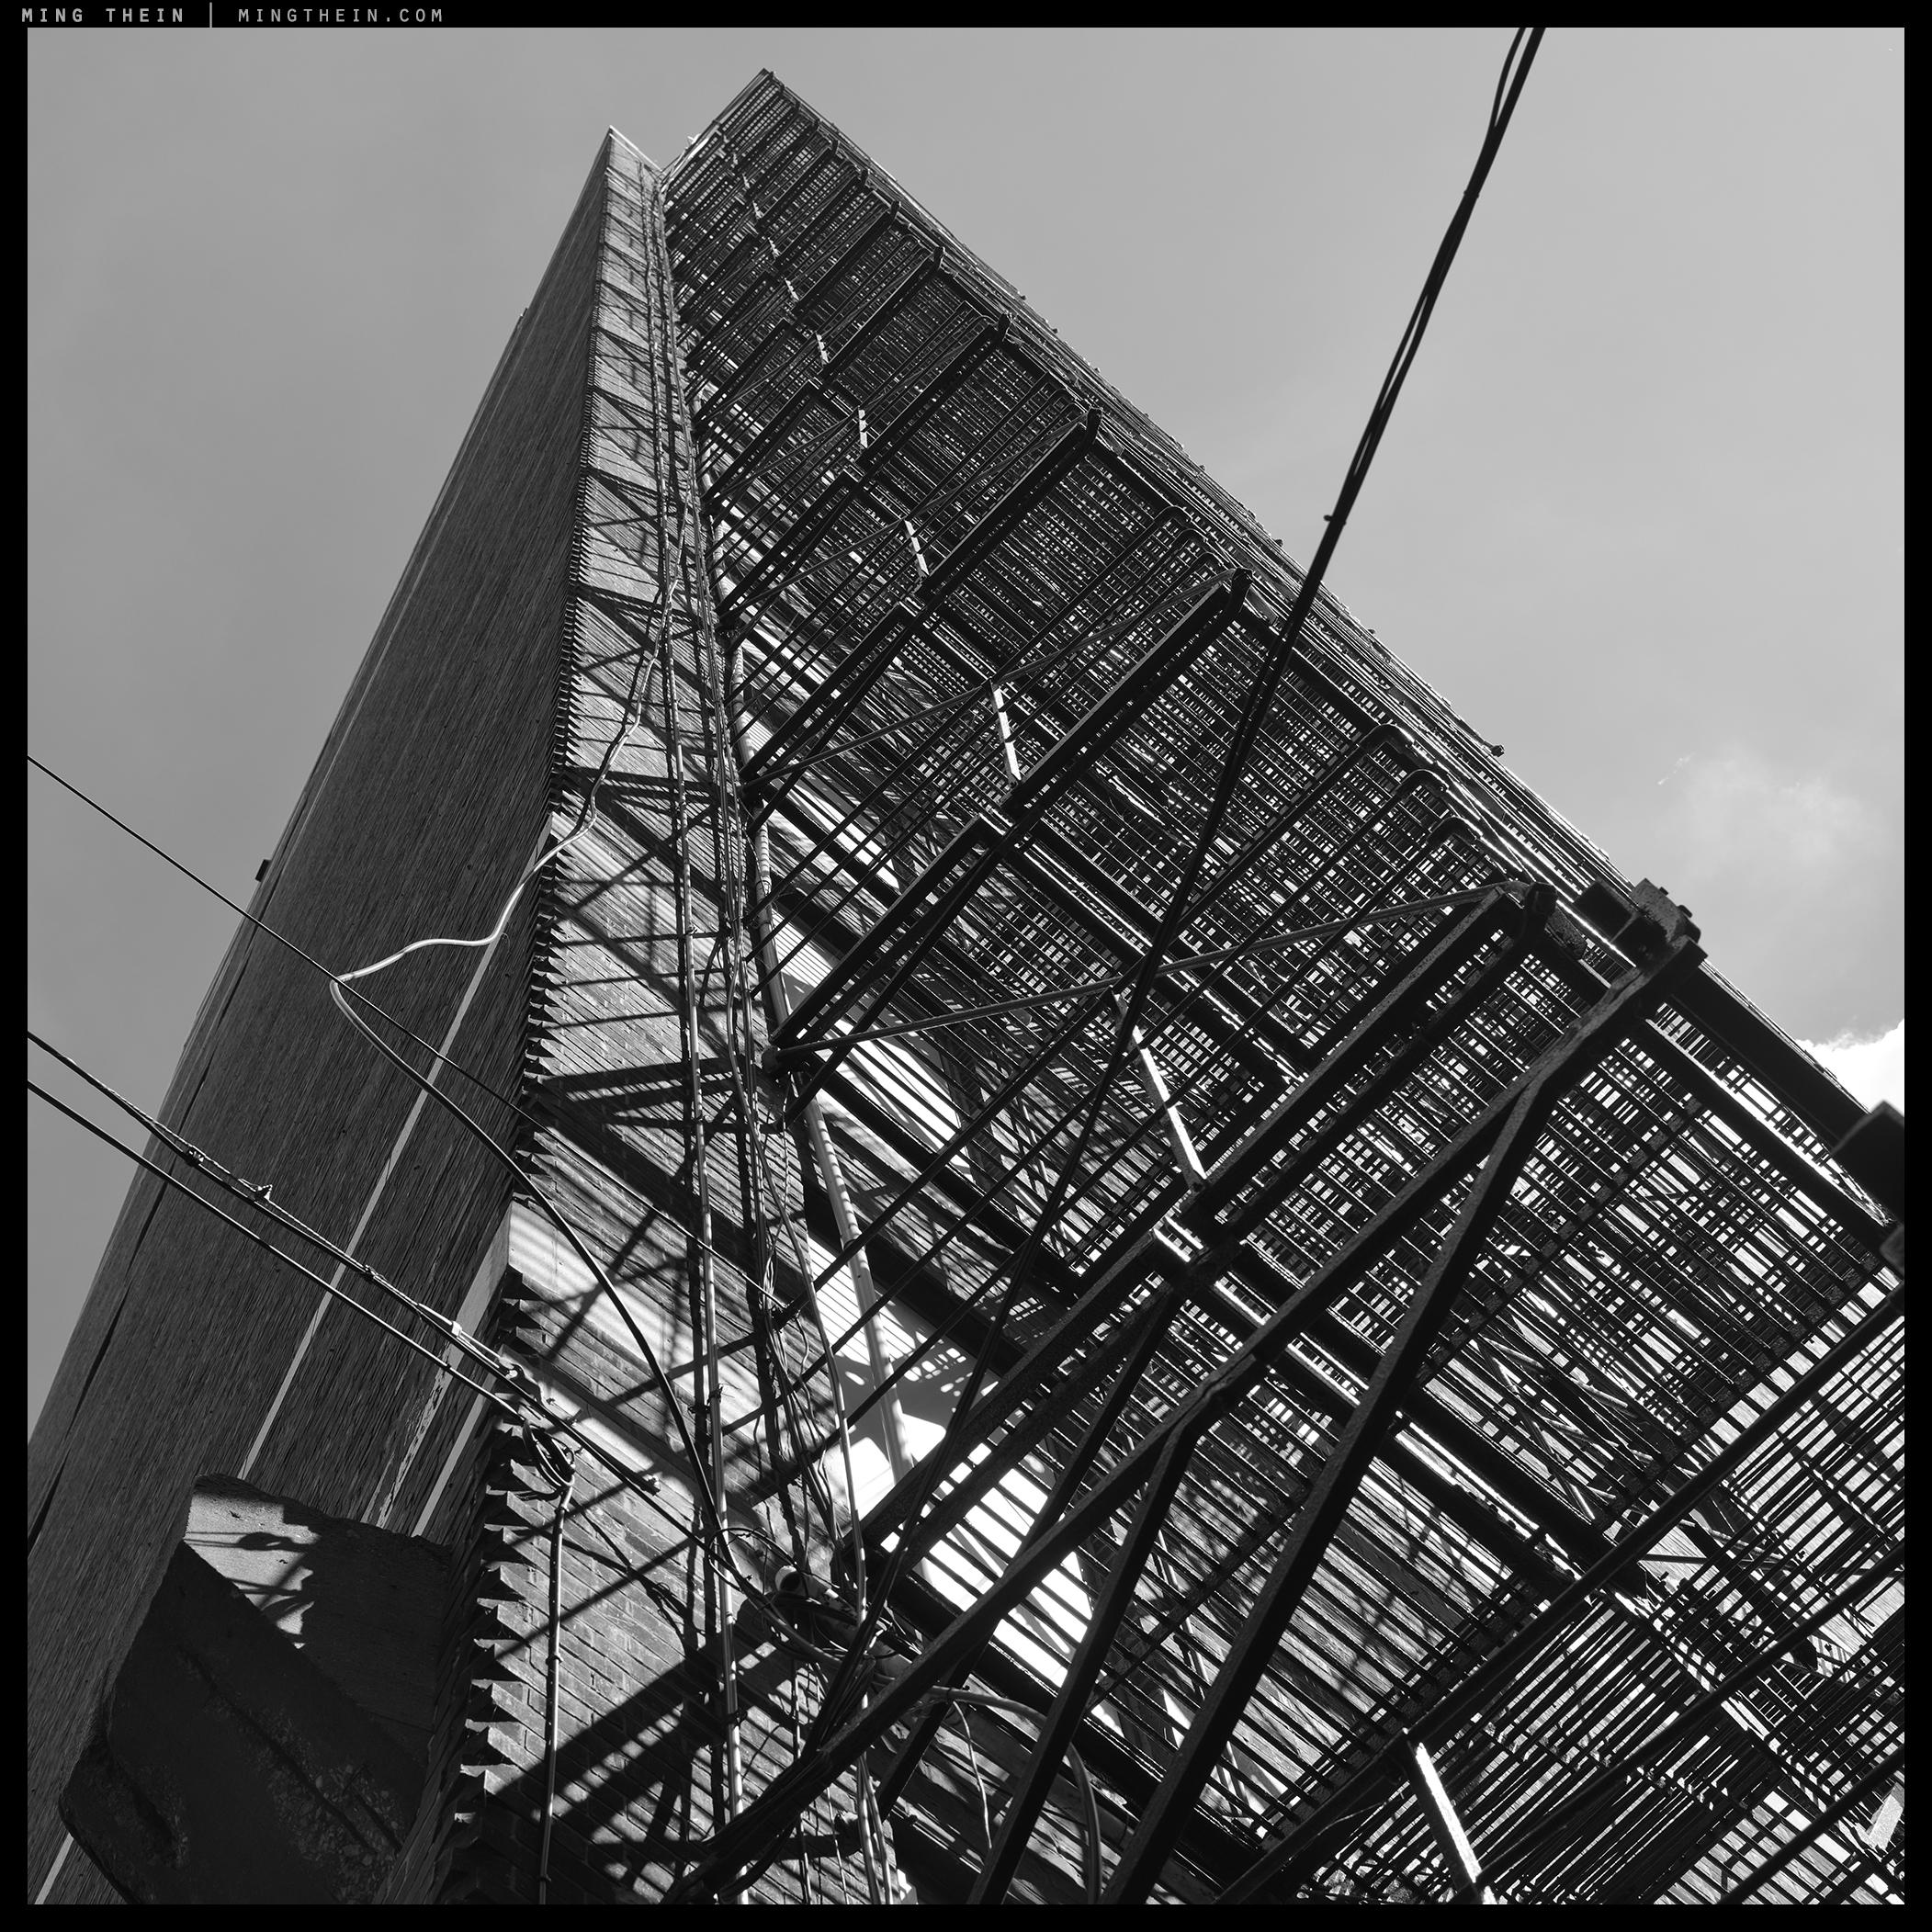 36_64Z3130 verticality XXXVI copy.jpg